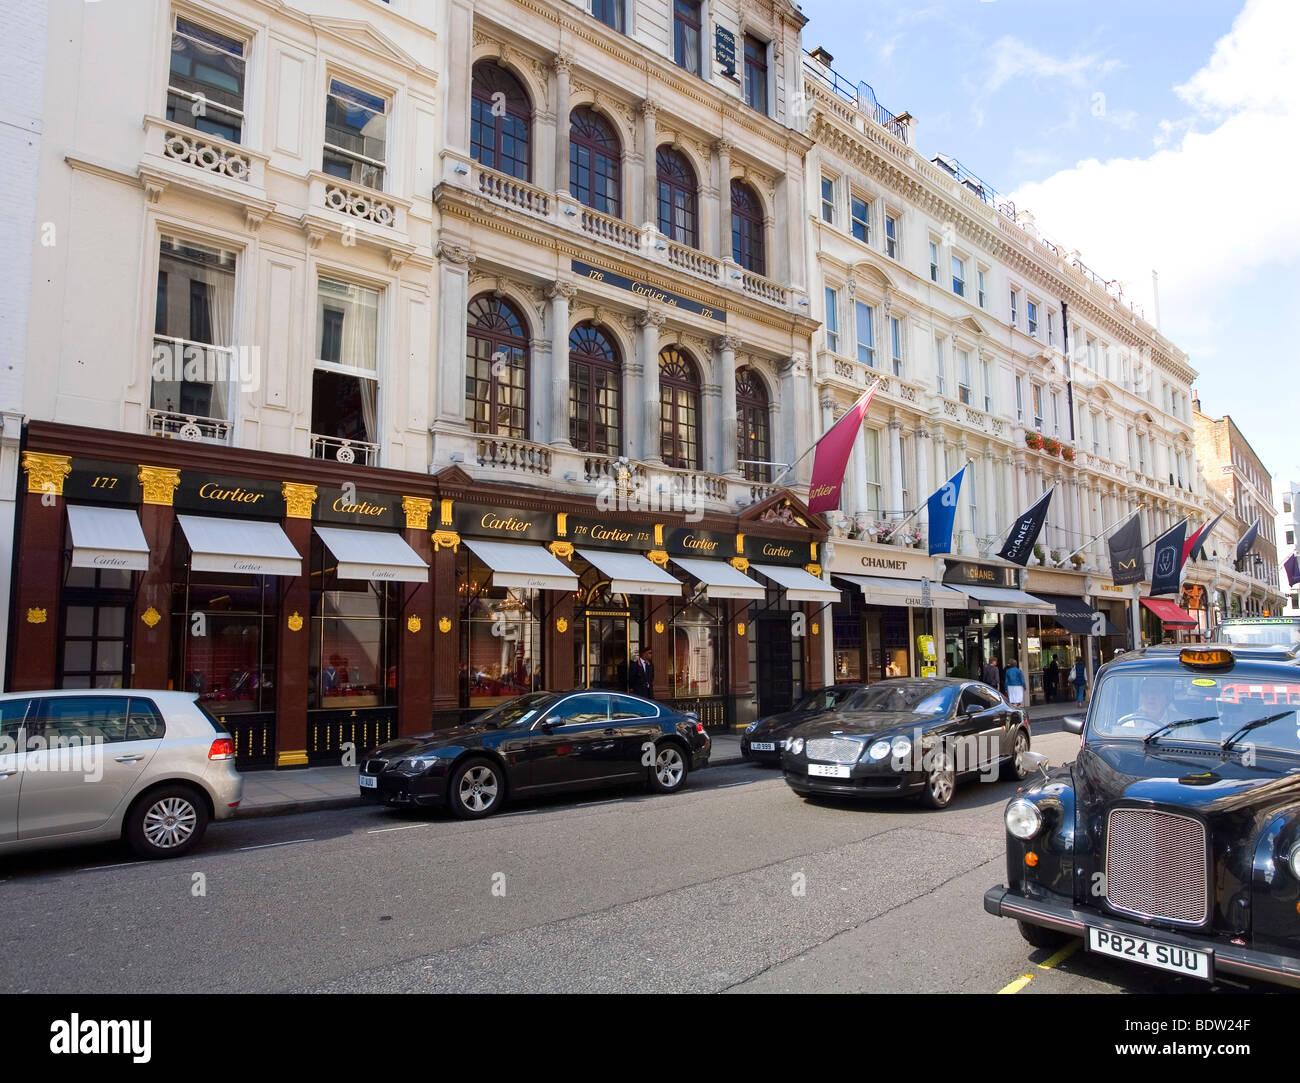 Myfair Com: Cartier Jewellery In New Bond Street Mayfair London